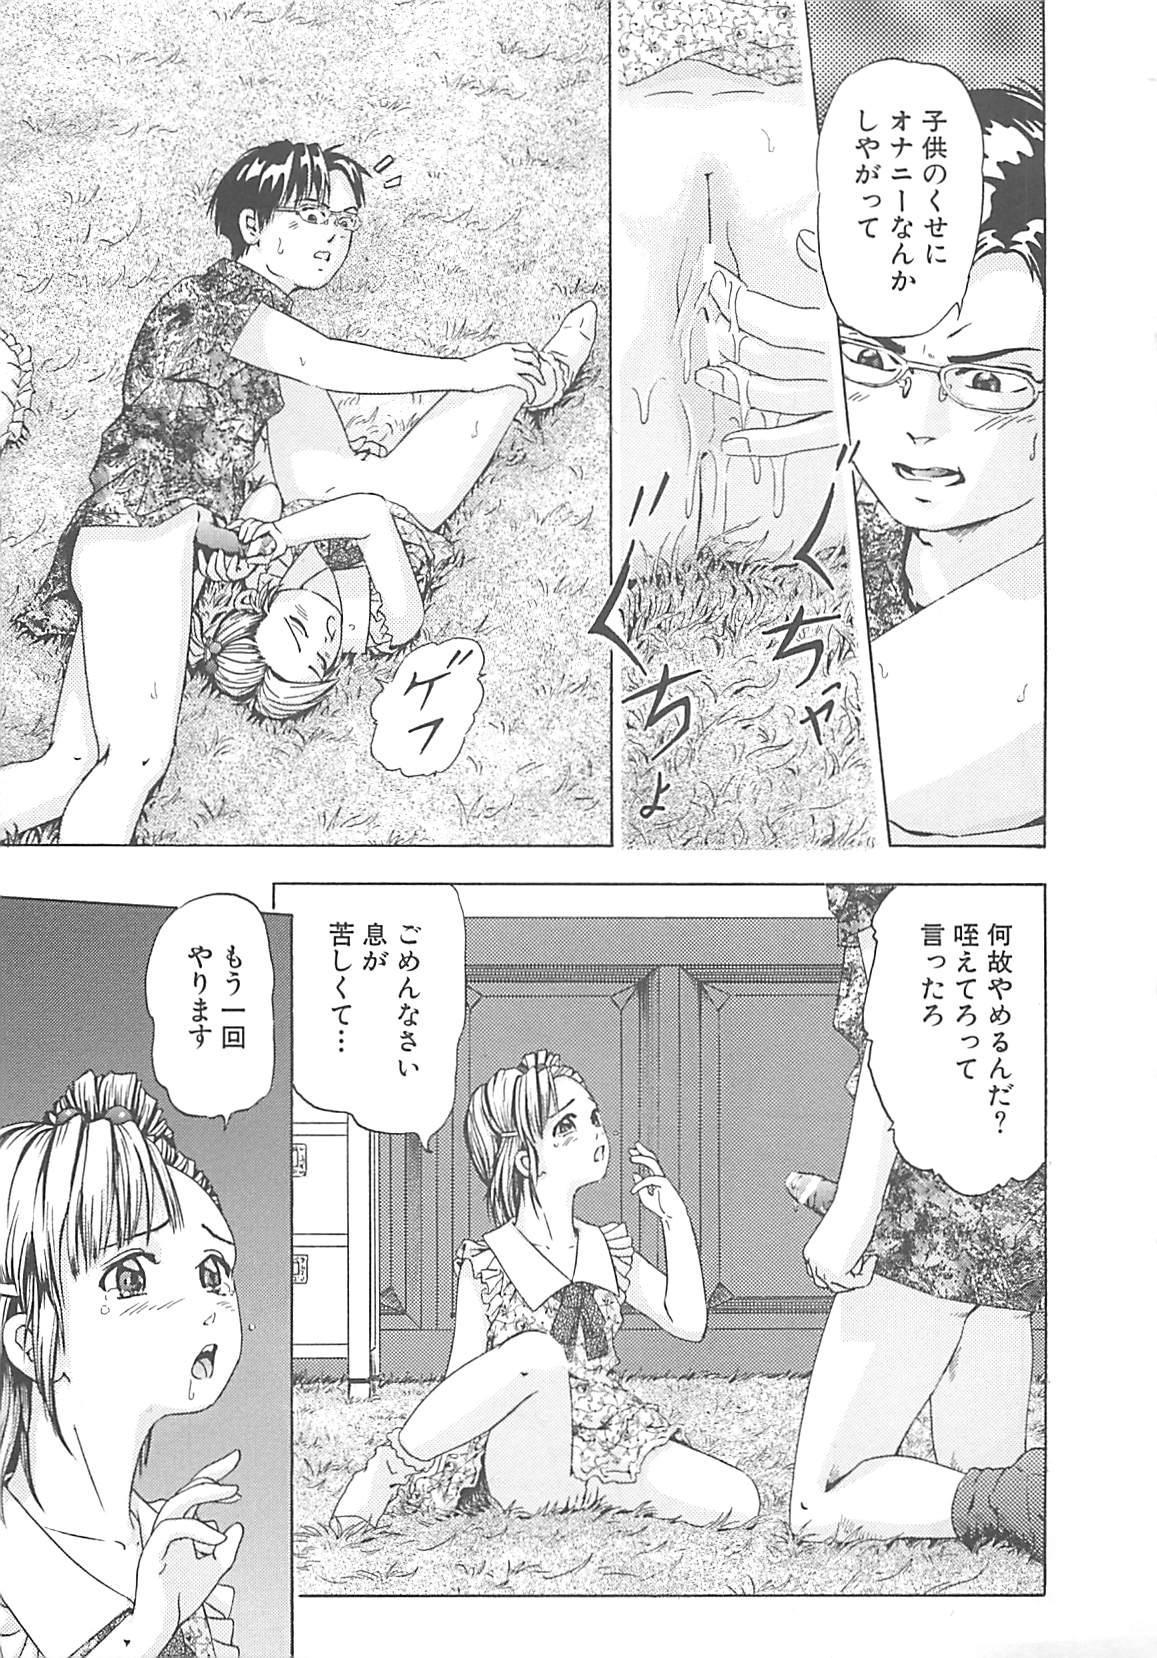 Kanin Kyoushitsu - Adultery Classroom 61